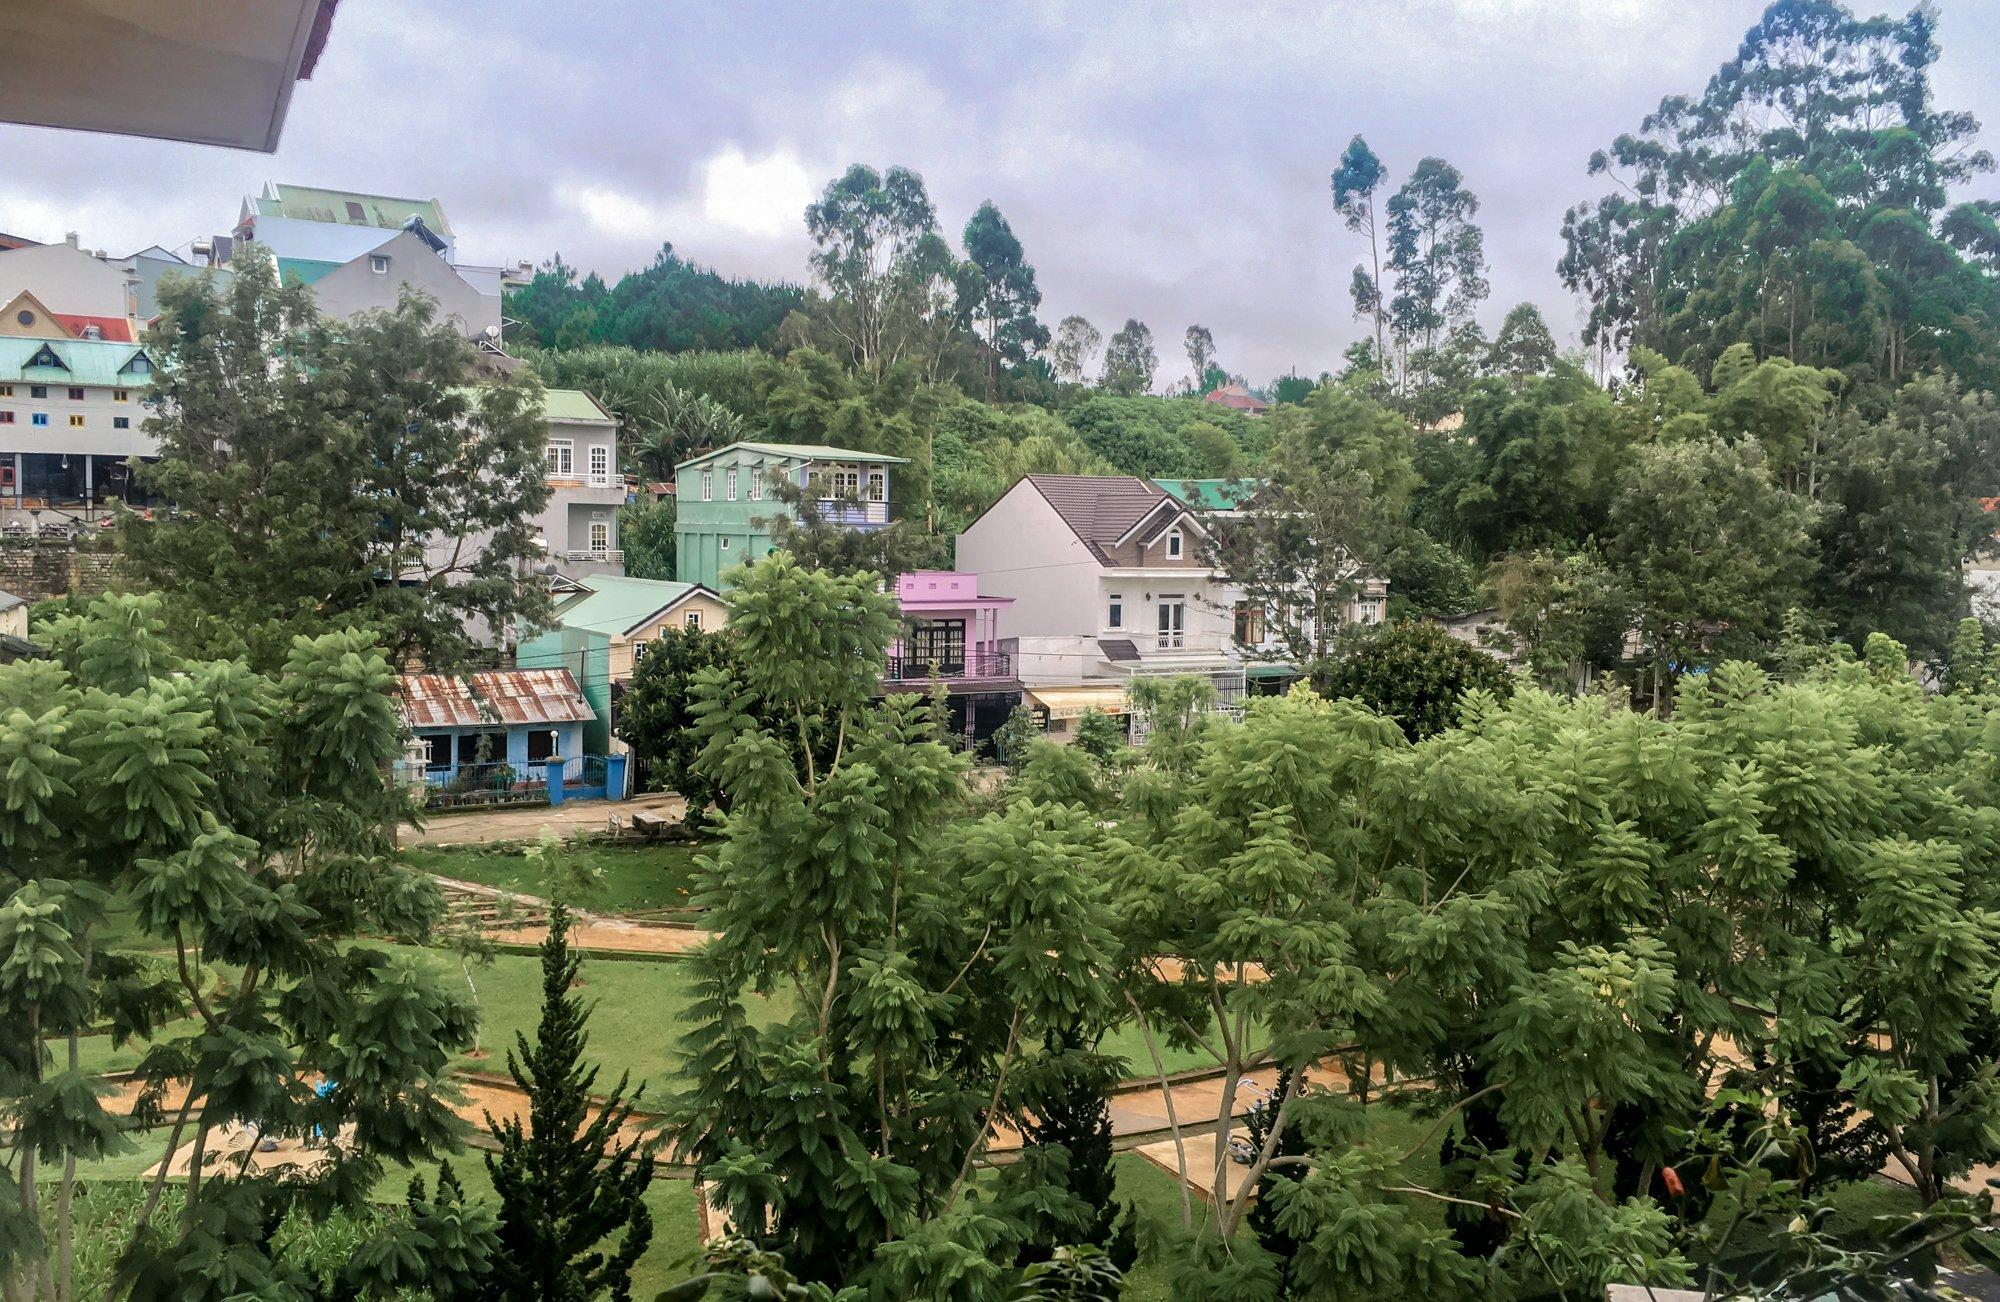 Our Neighborhood in Dalat, Vietnam